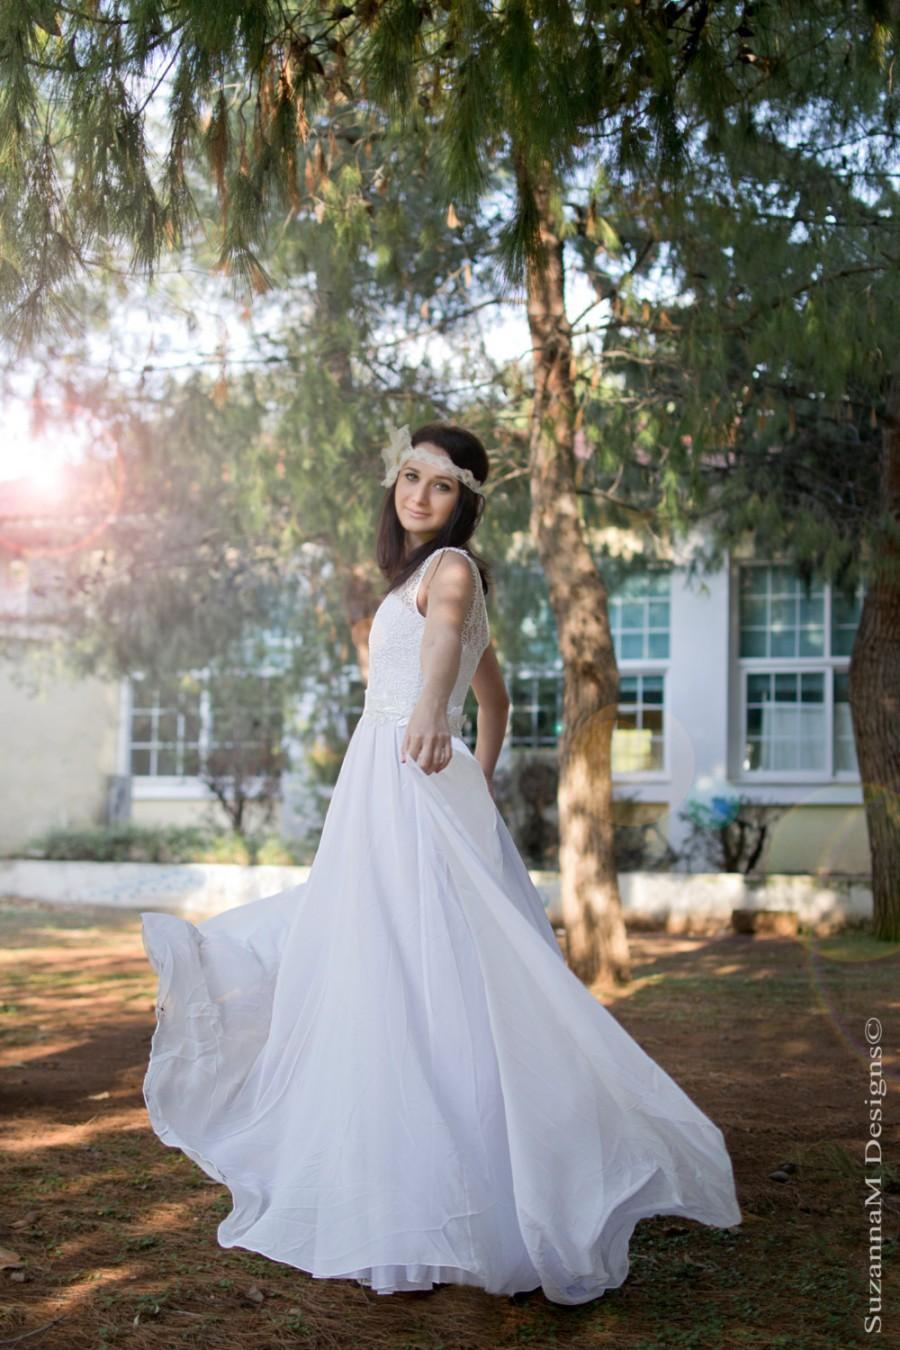 زفاف - Long Wedding Dress White Bridal Dress Lace and Silk Chiffon  Wedding Gown - Handmade by SuzannaM Designs